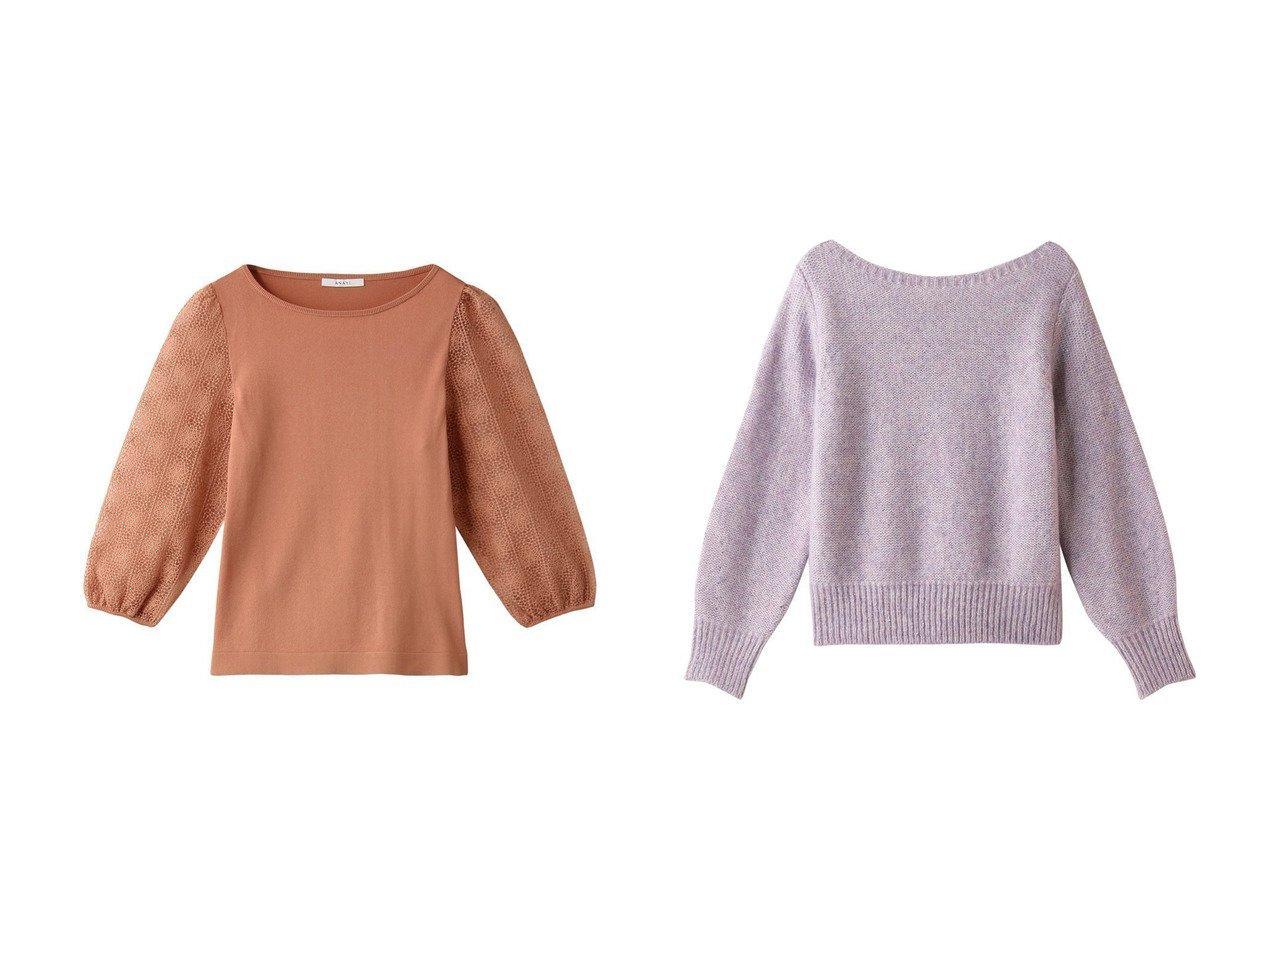 【ANAYI/アナイ】の幾何学エンブロイダリープルオーバー&スパンコールヤーンテンジクプルオーバー トップス・カットソーのおすすめ!人気、トレンド・レディースファッションの通販 おすすめで人気の流行・トレンド、ファッションの通販商品 メンズファッション・キッズファッション・インテリア・家具・レディースファッション・服の通販 founy(ファニー) https://founy.com/ ファッション Fashion レディースファッション WOMEN トップス Tops Tshirt ニット Knit Tops プルオーバー Pullover コンパクト フェミニン レース 定番 Standard |ID:crp329100000013112